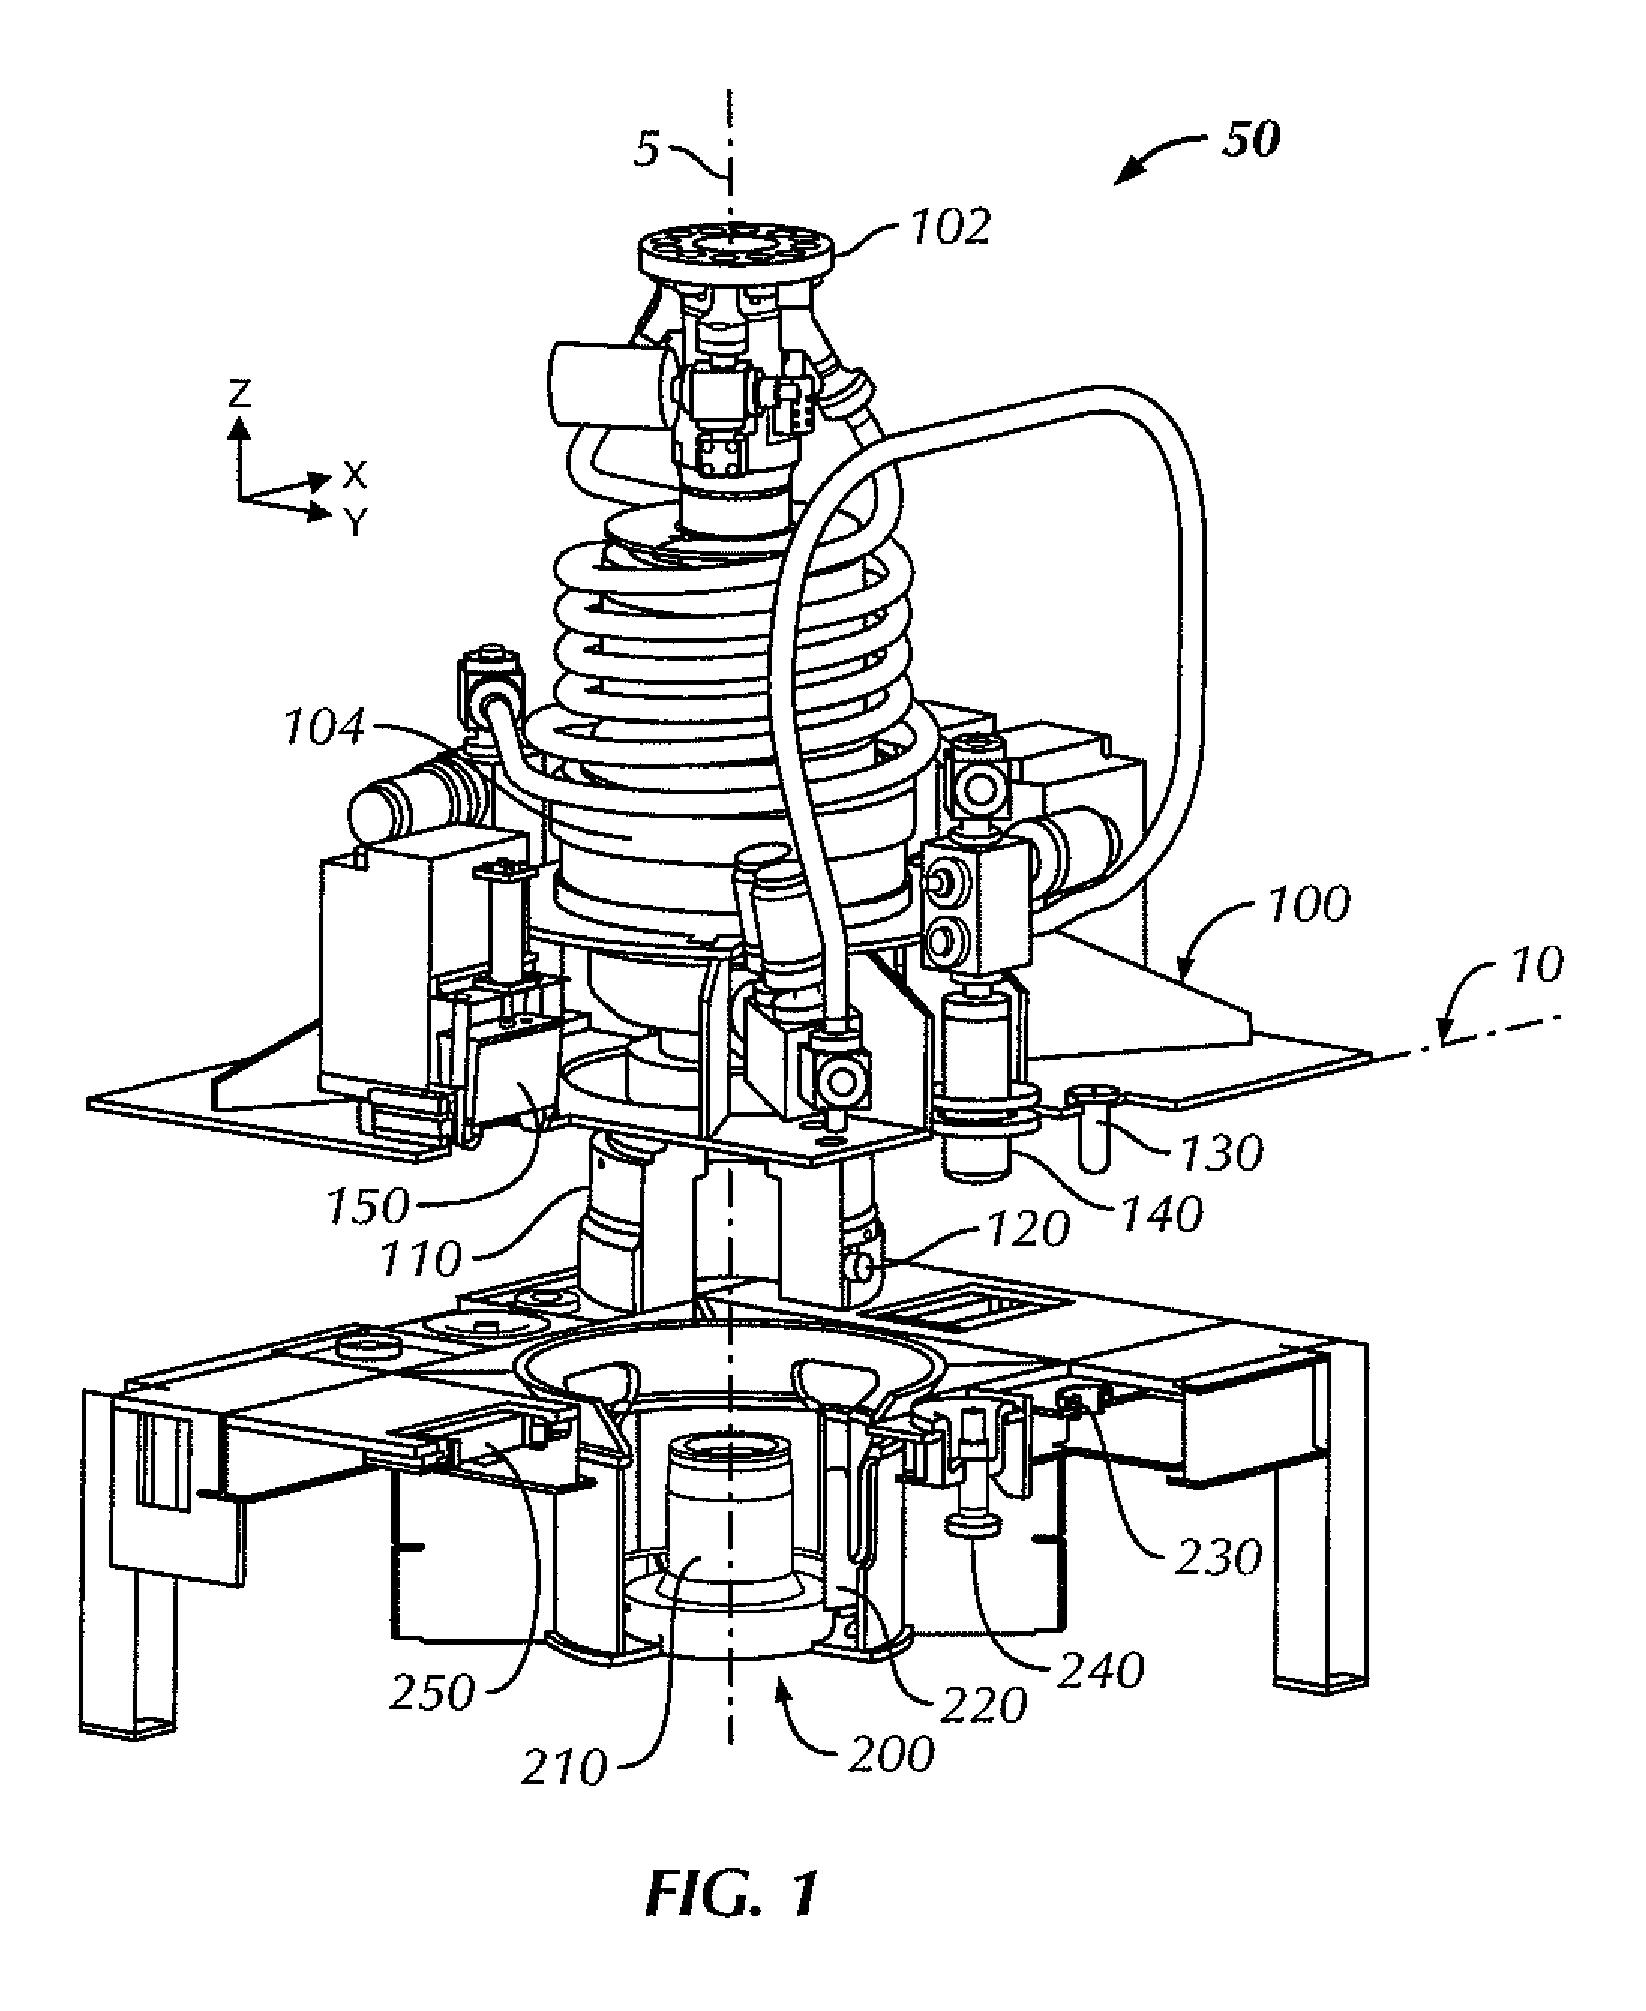 1998 Mazda 626 Vacuum Diagram 20l Trusted Wiring For 2002 Tribute 1999